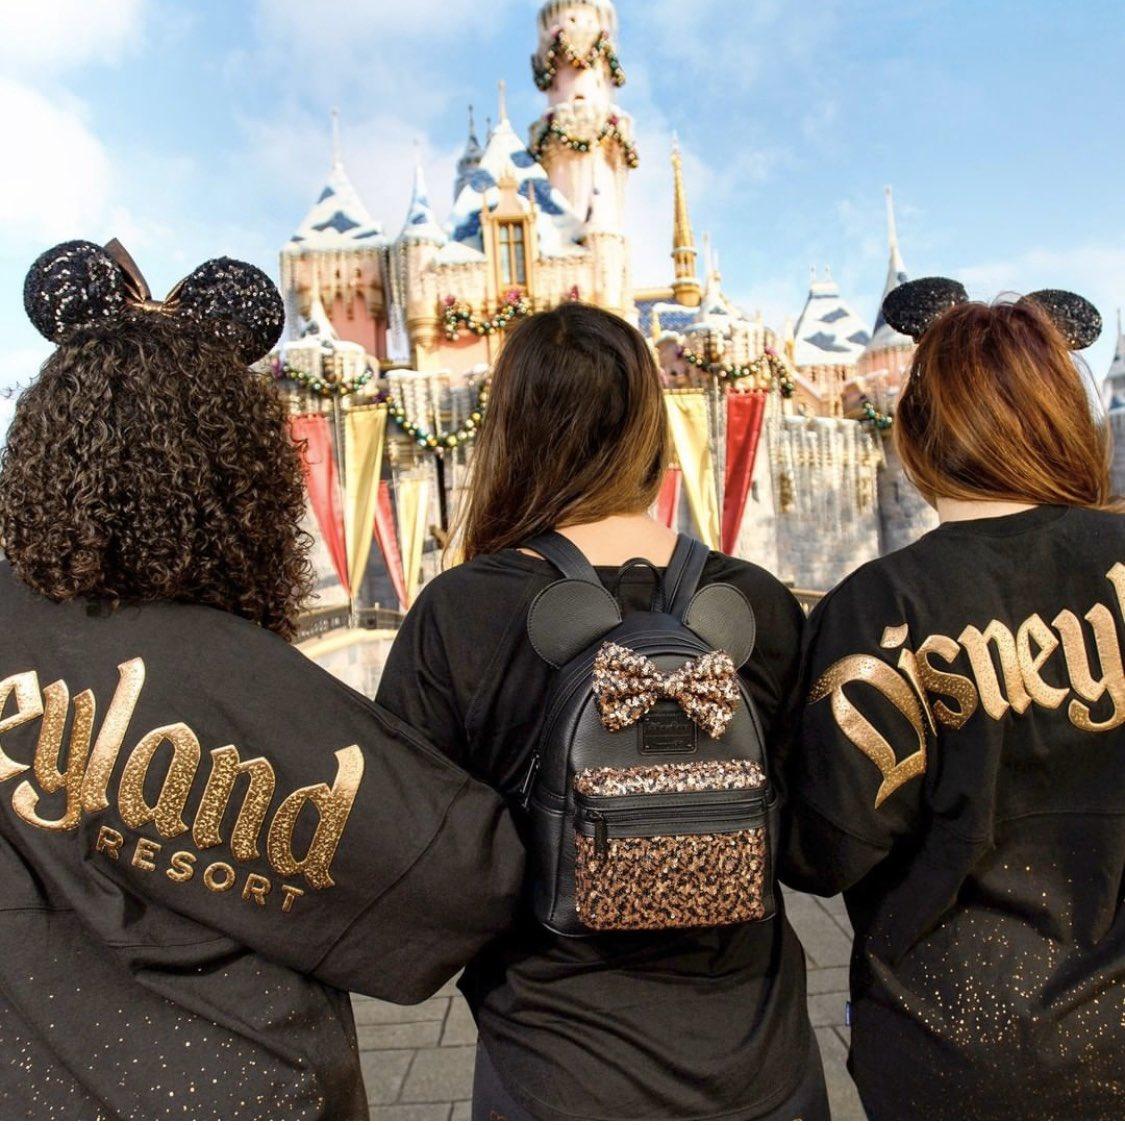 Have you seen the New #Disney #BelleoftheBall Collection?! ✨Bronze is the latest craze to hit #shopDisney and the #DisneyParks. 💖 • #disneystyle #disneymerch #disneyears #disneybronzecollection #disneyfashion #disney #disneysprings #waltdisneyworld #disneyland #centerofmagic